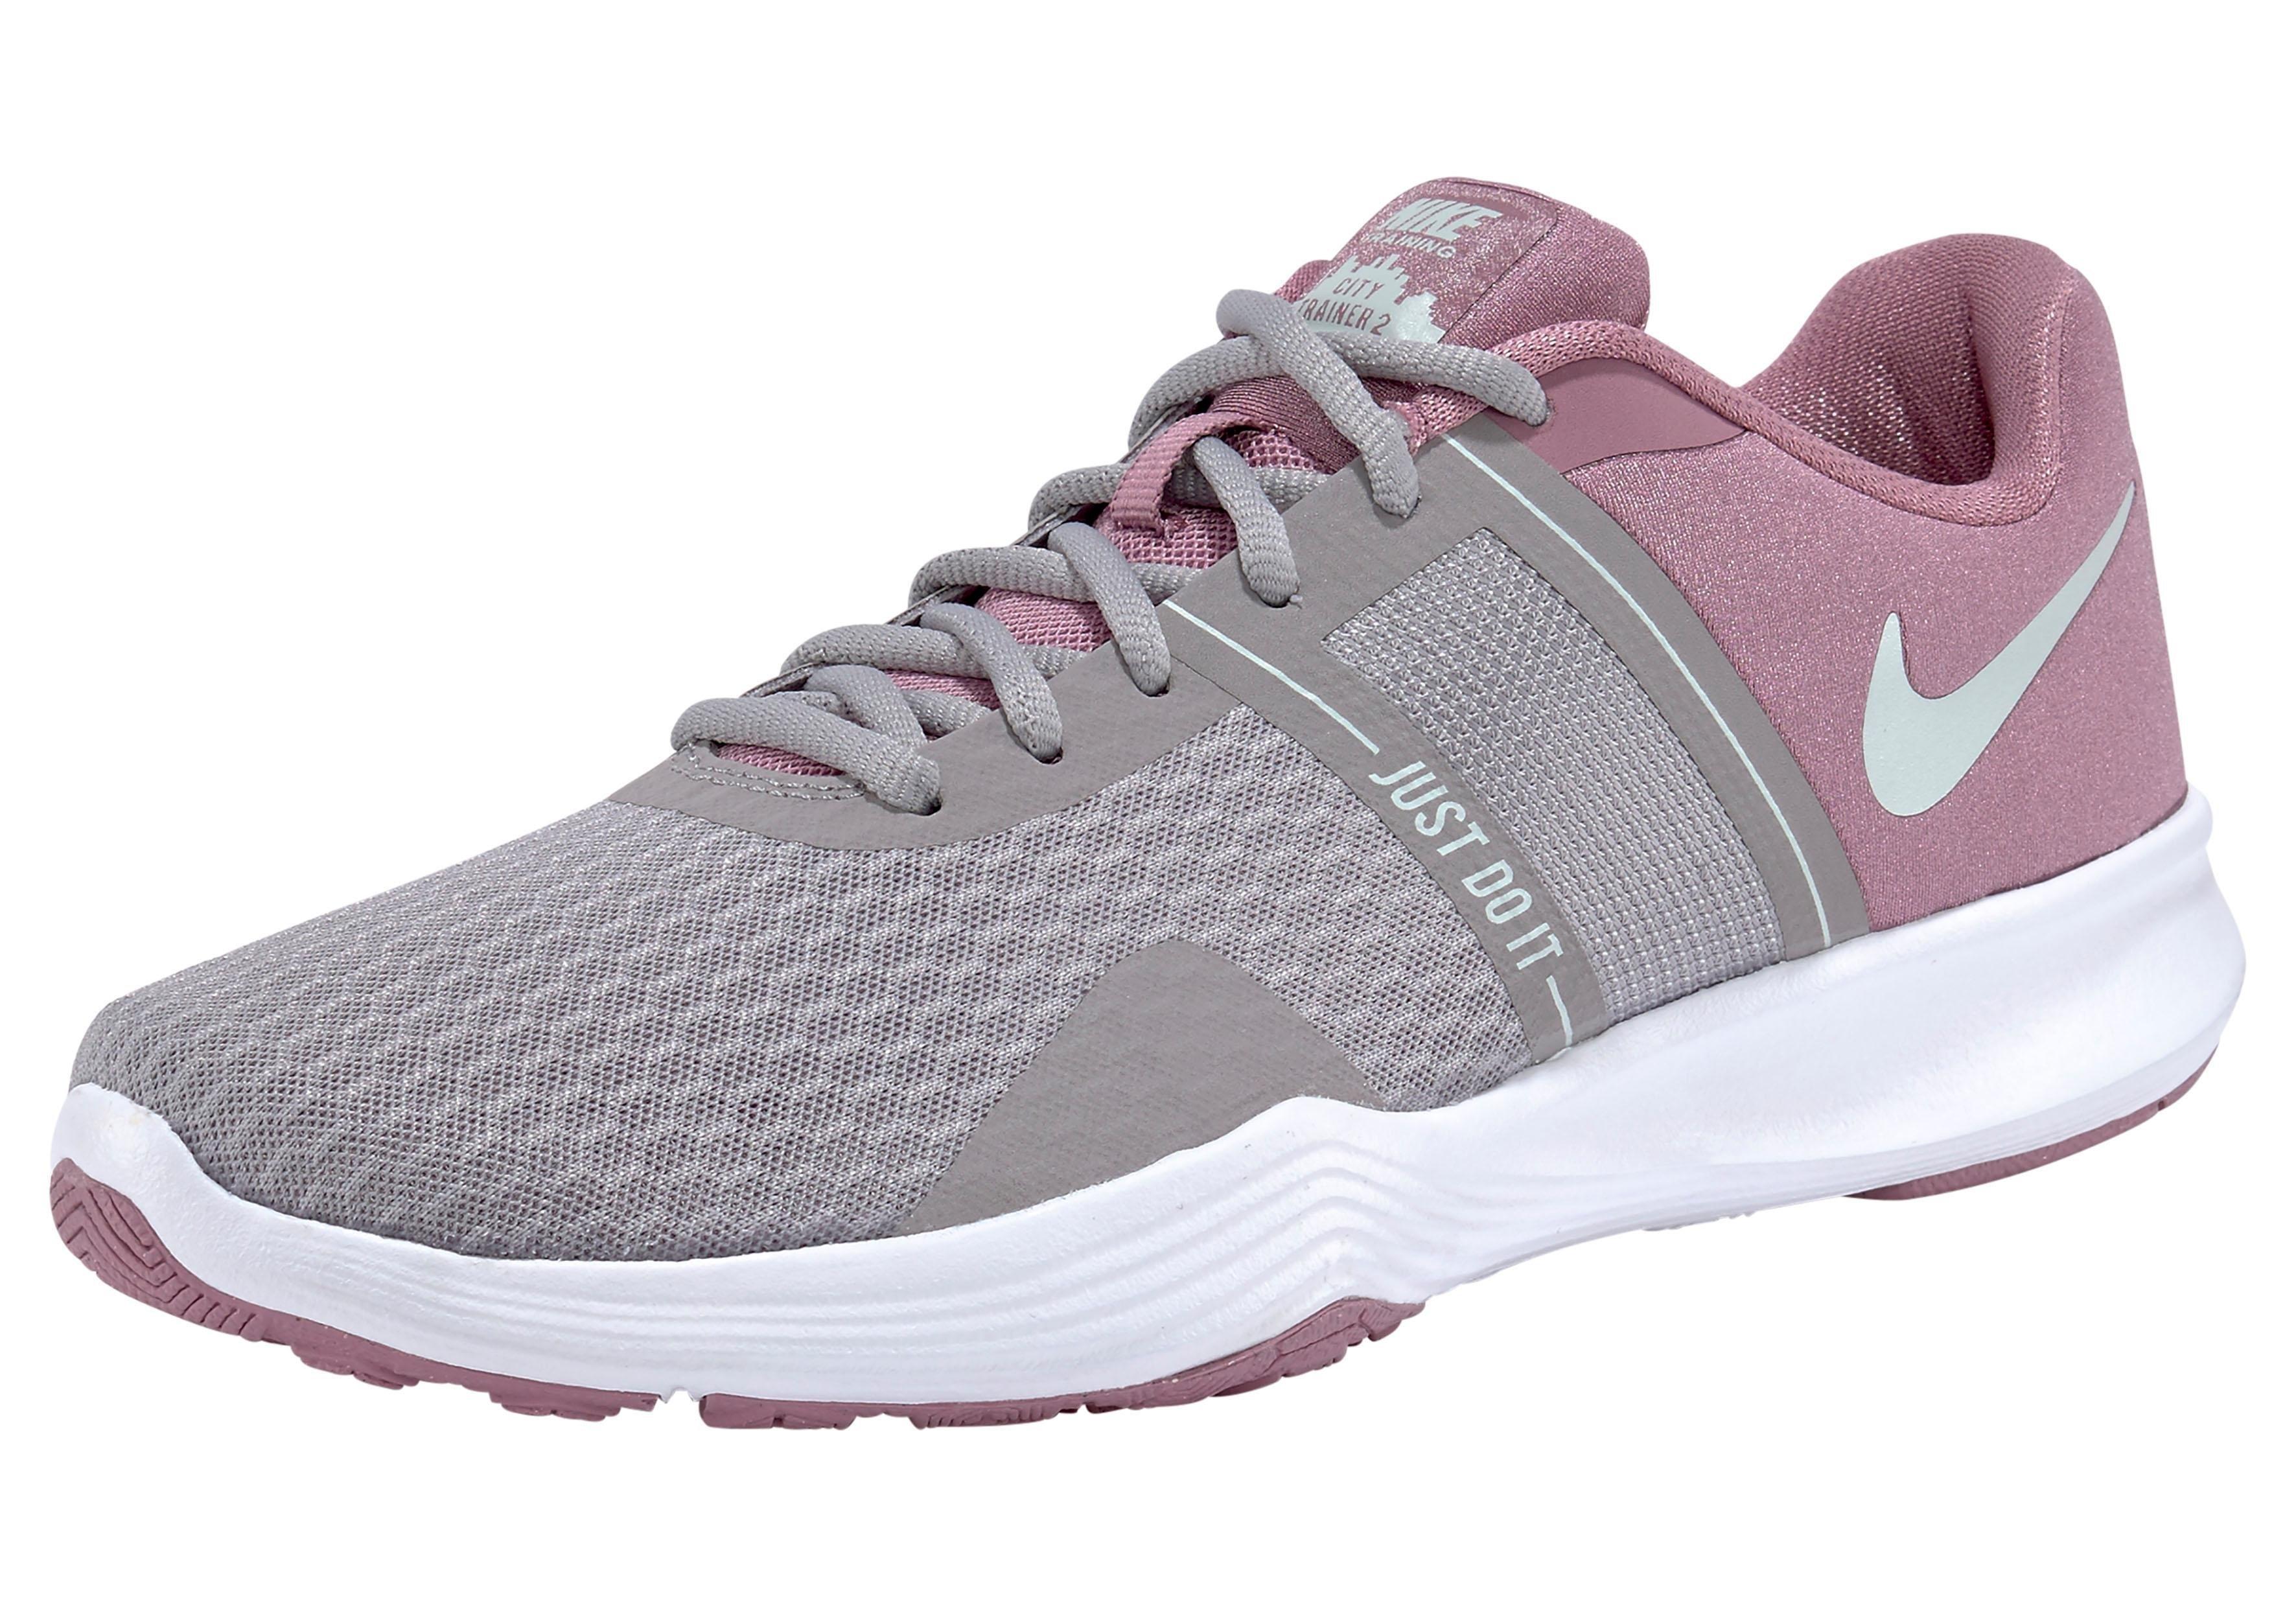 62e47bd24b9 Nike fitnessschoenen »Wmns City Trainer 2« in de online shop | OTTO